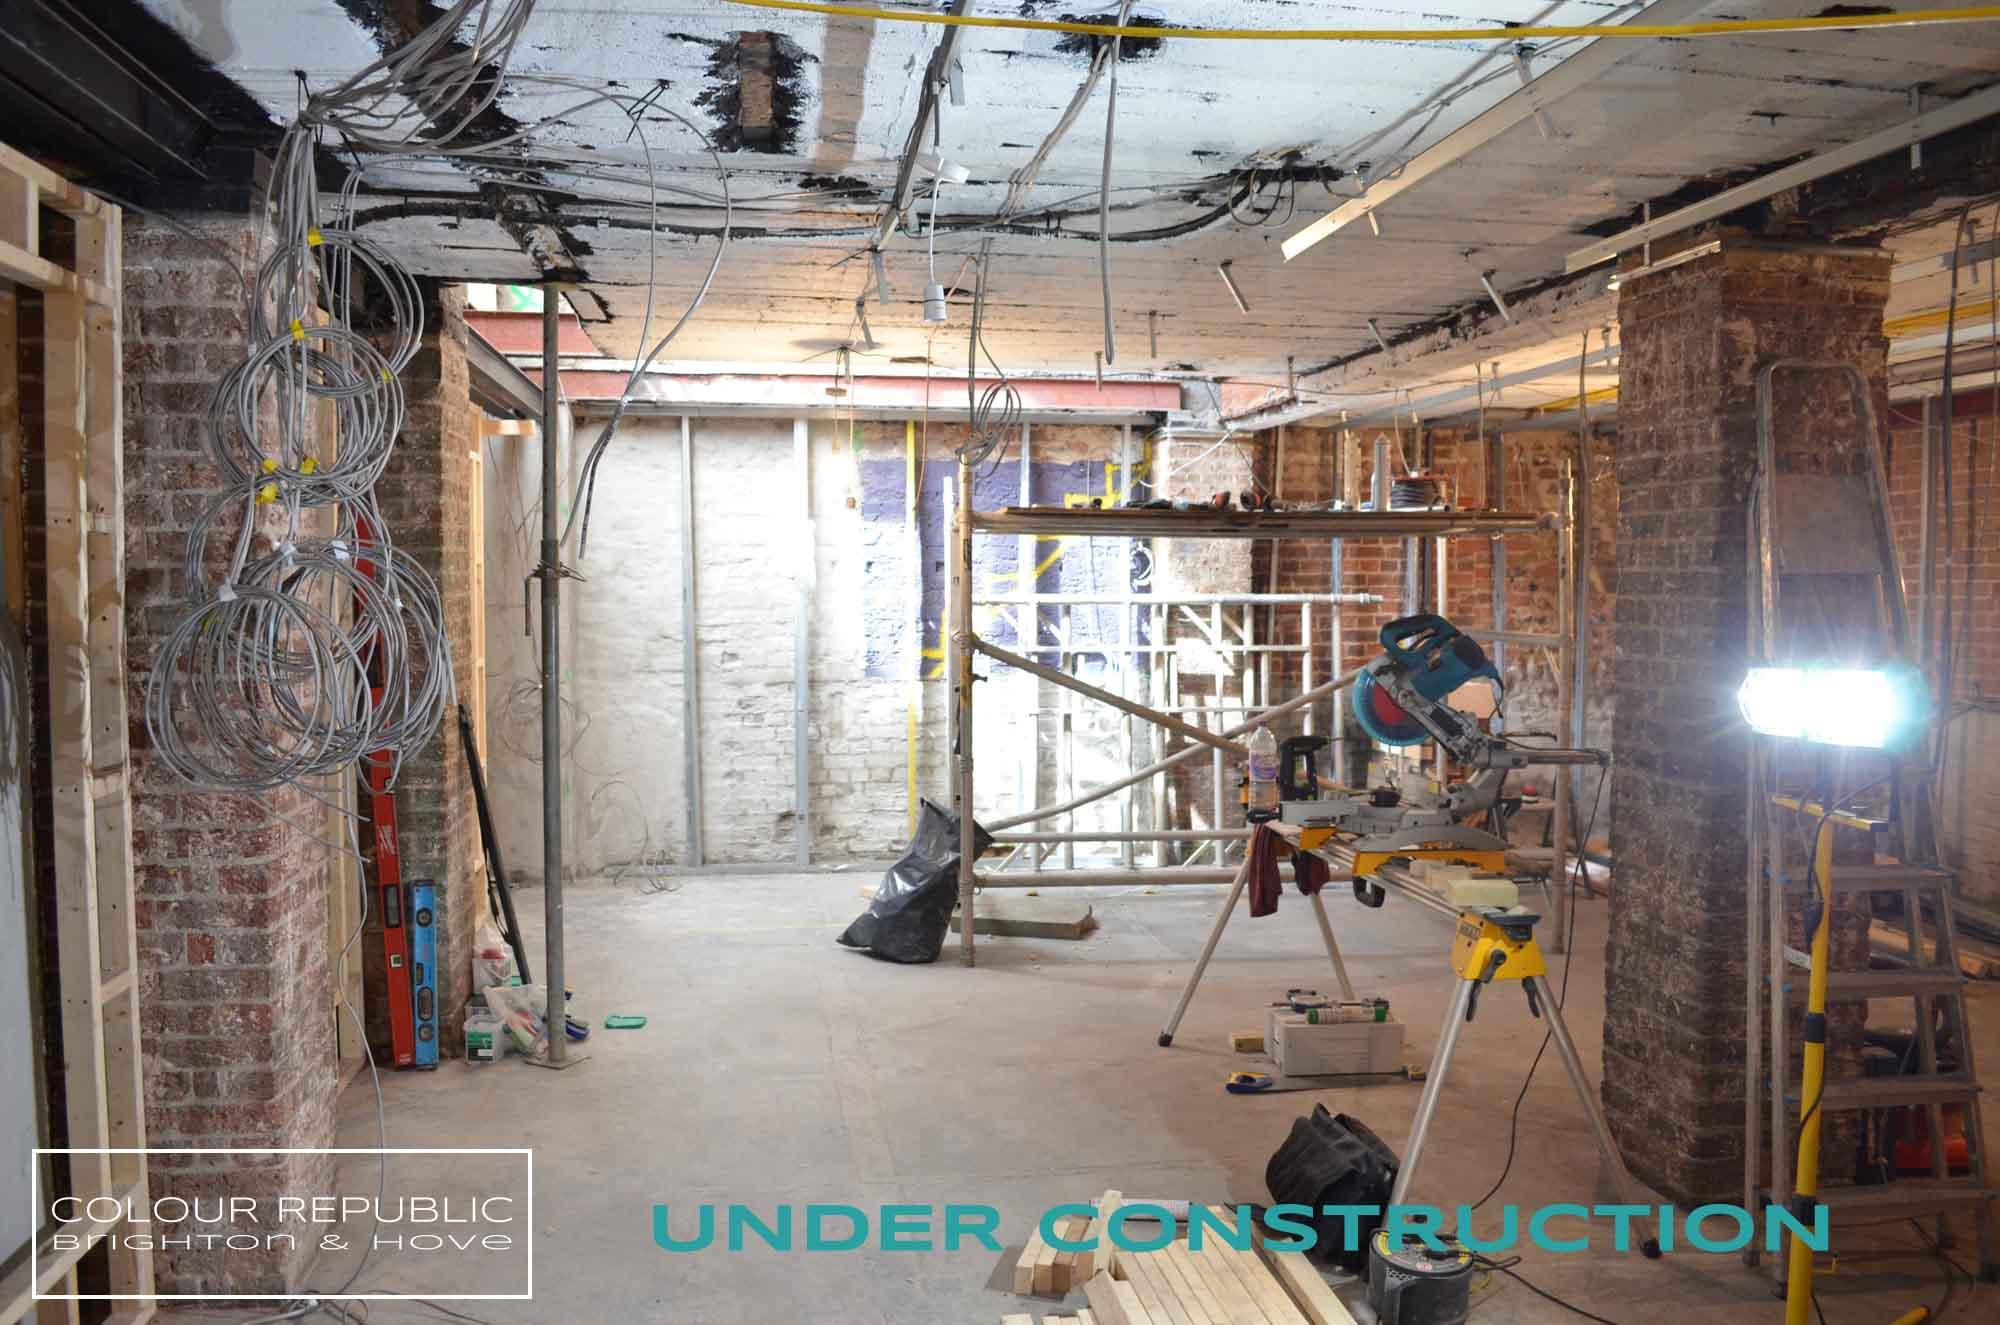 Building works in progress basement